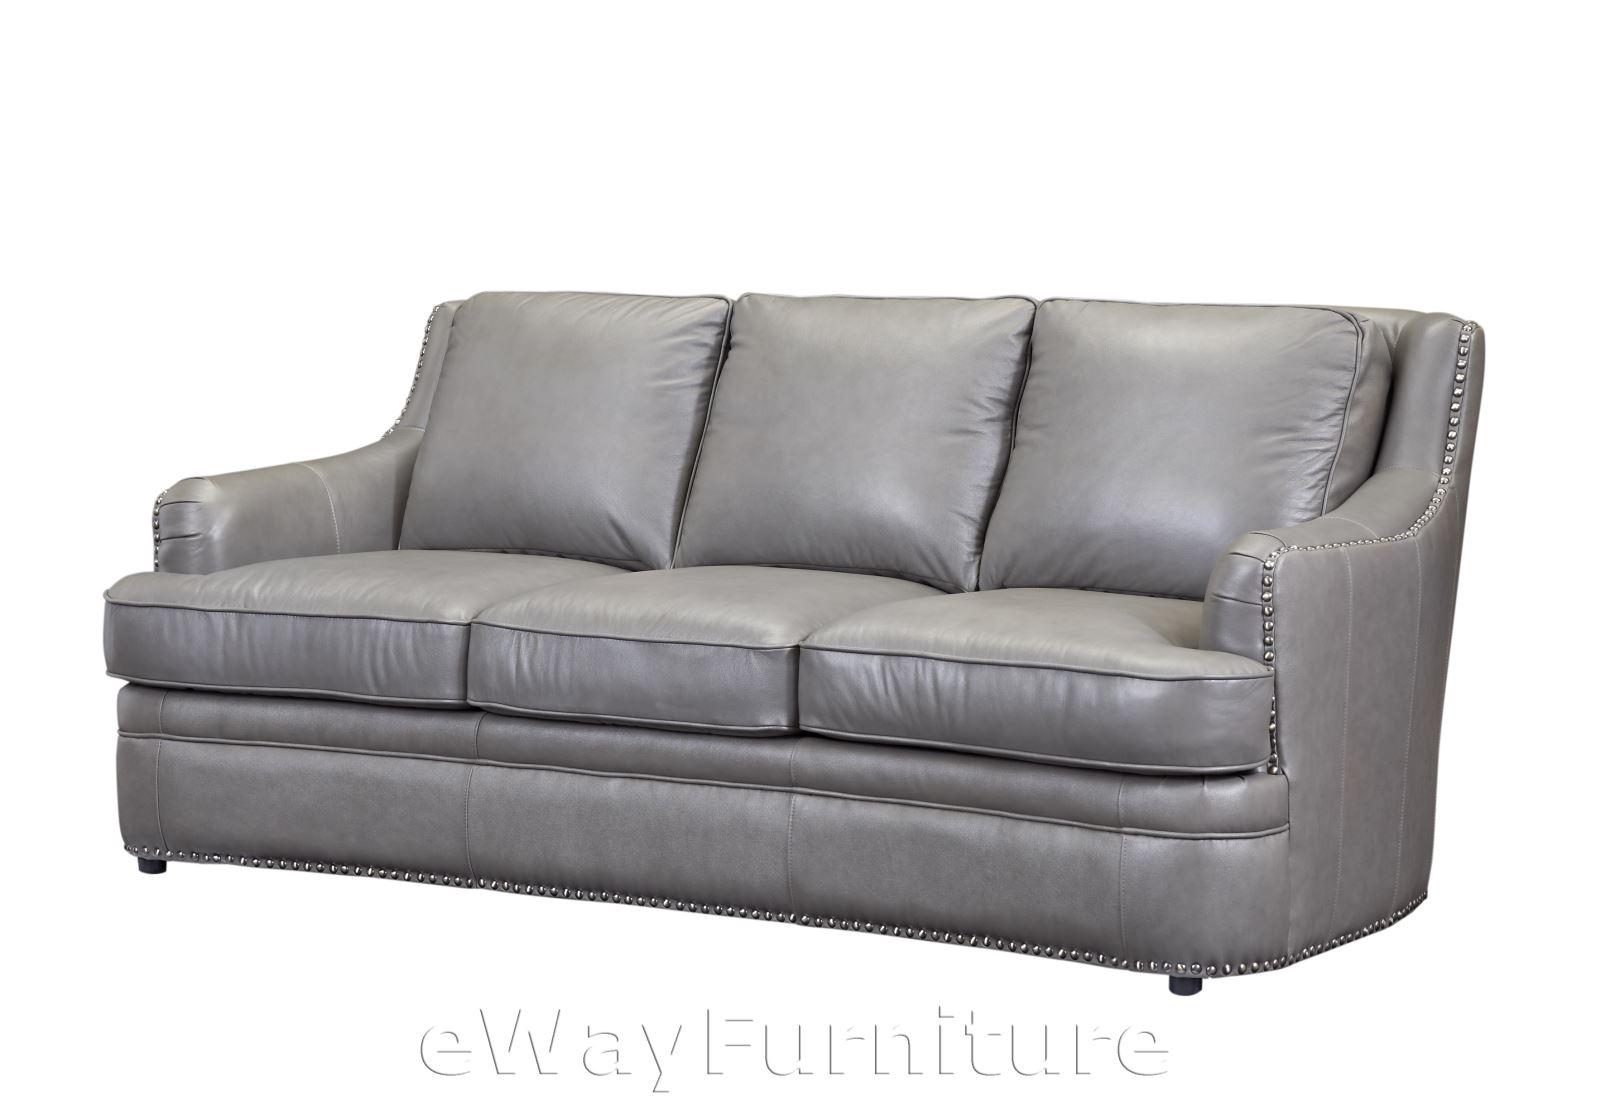 leather sofas tulsa 3 seater black sofa bed top grain in dark grey